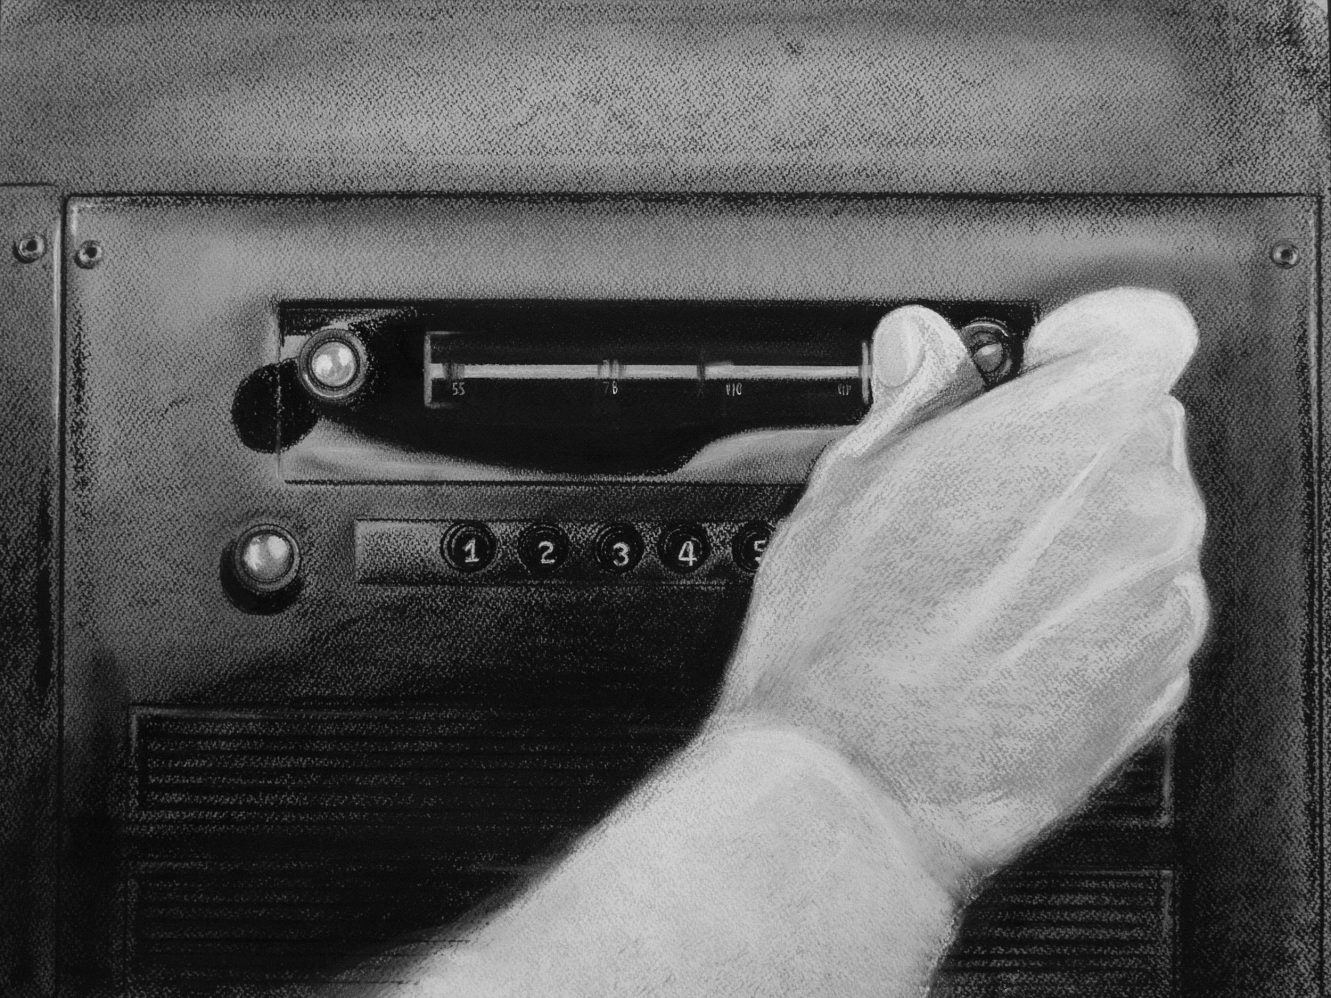 Radio. Serie Fatale, 2018 | Radio. Series Fatale, 2018 Lápiz y pastel sobre papel | Pencil and pastel on paper 41 x 54,5 cm | 16.1 x 21.5 in